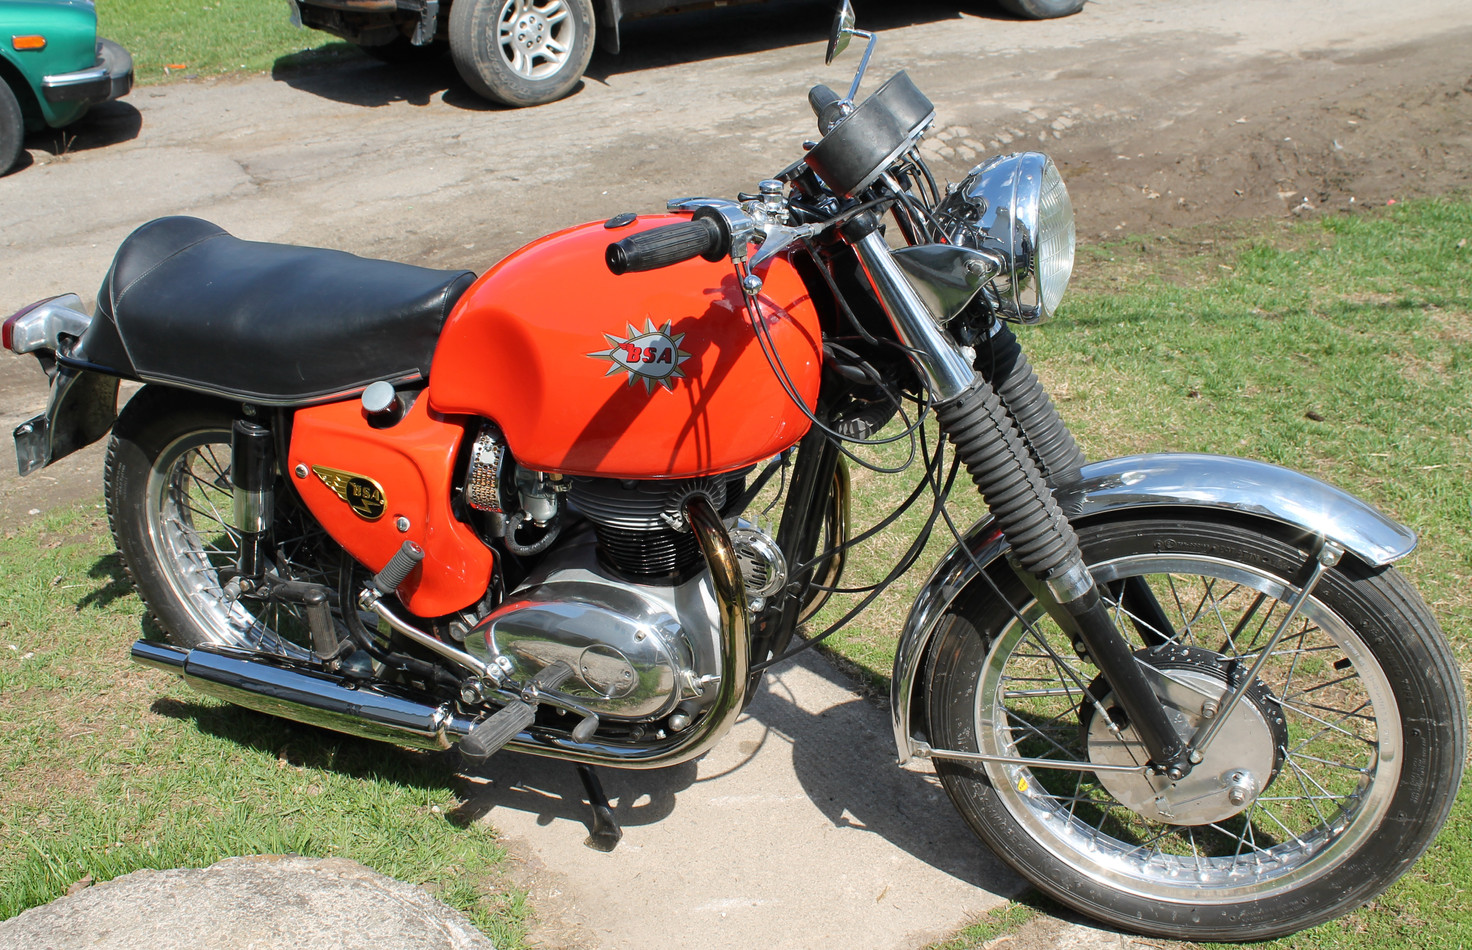 1966 650 BSA Spitfire motorcycle